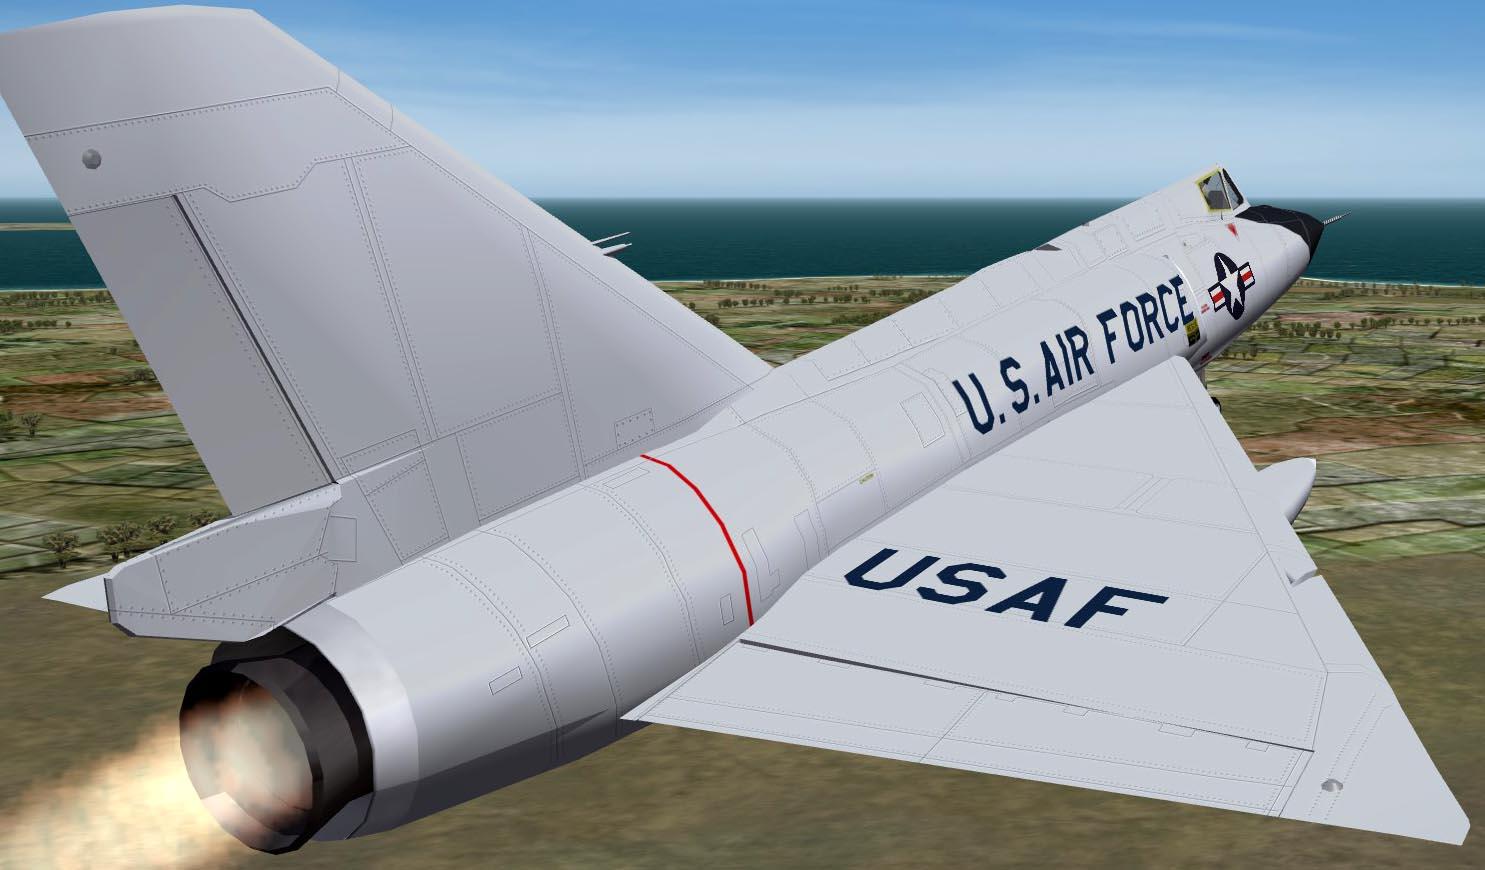 F-106A Templates for Pasko and Column5's Delta Dart